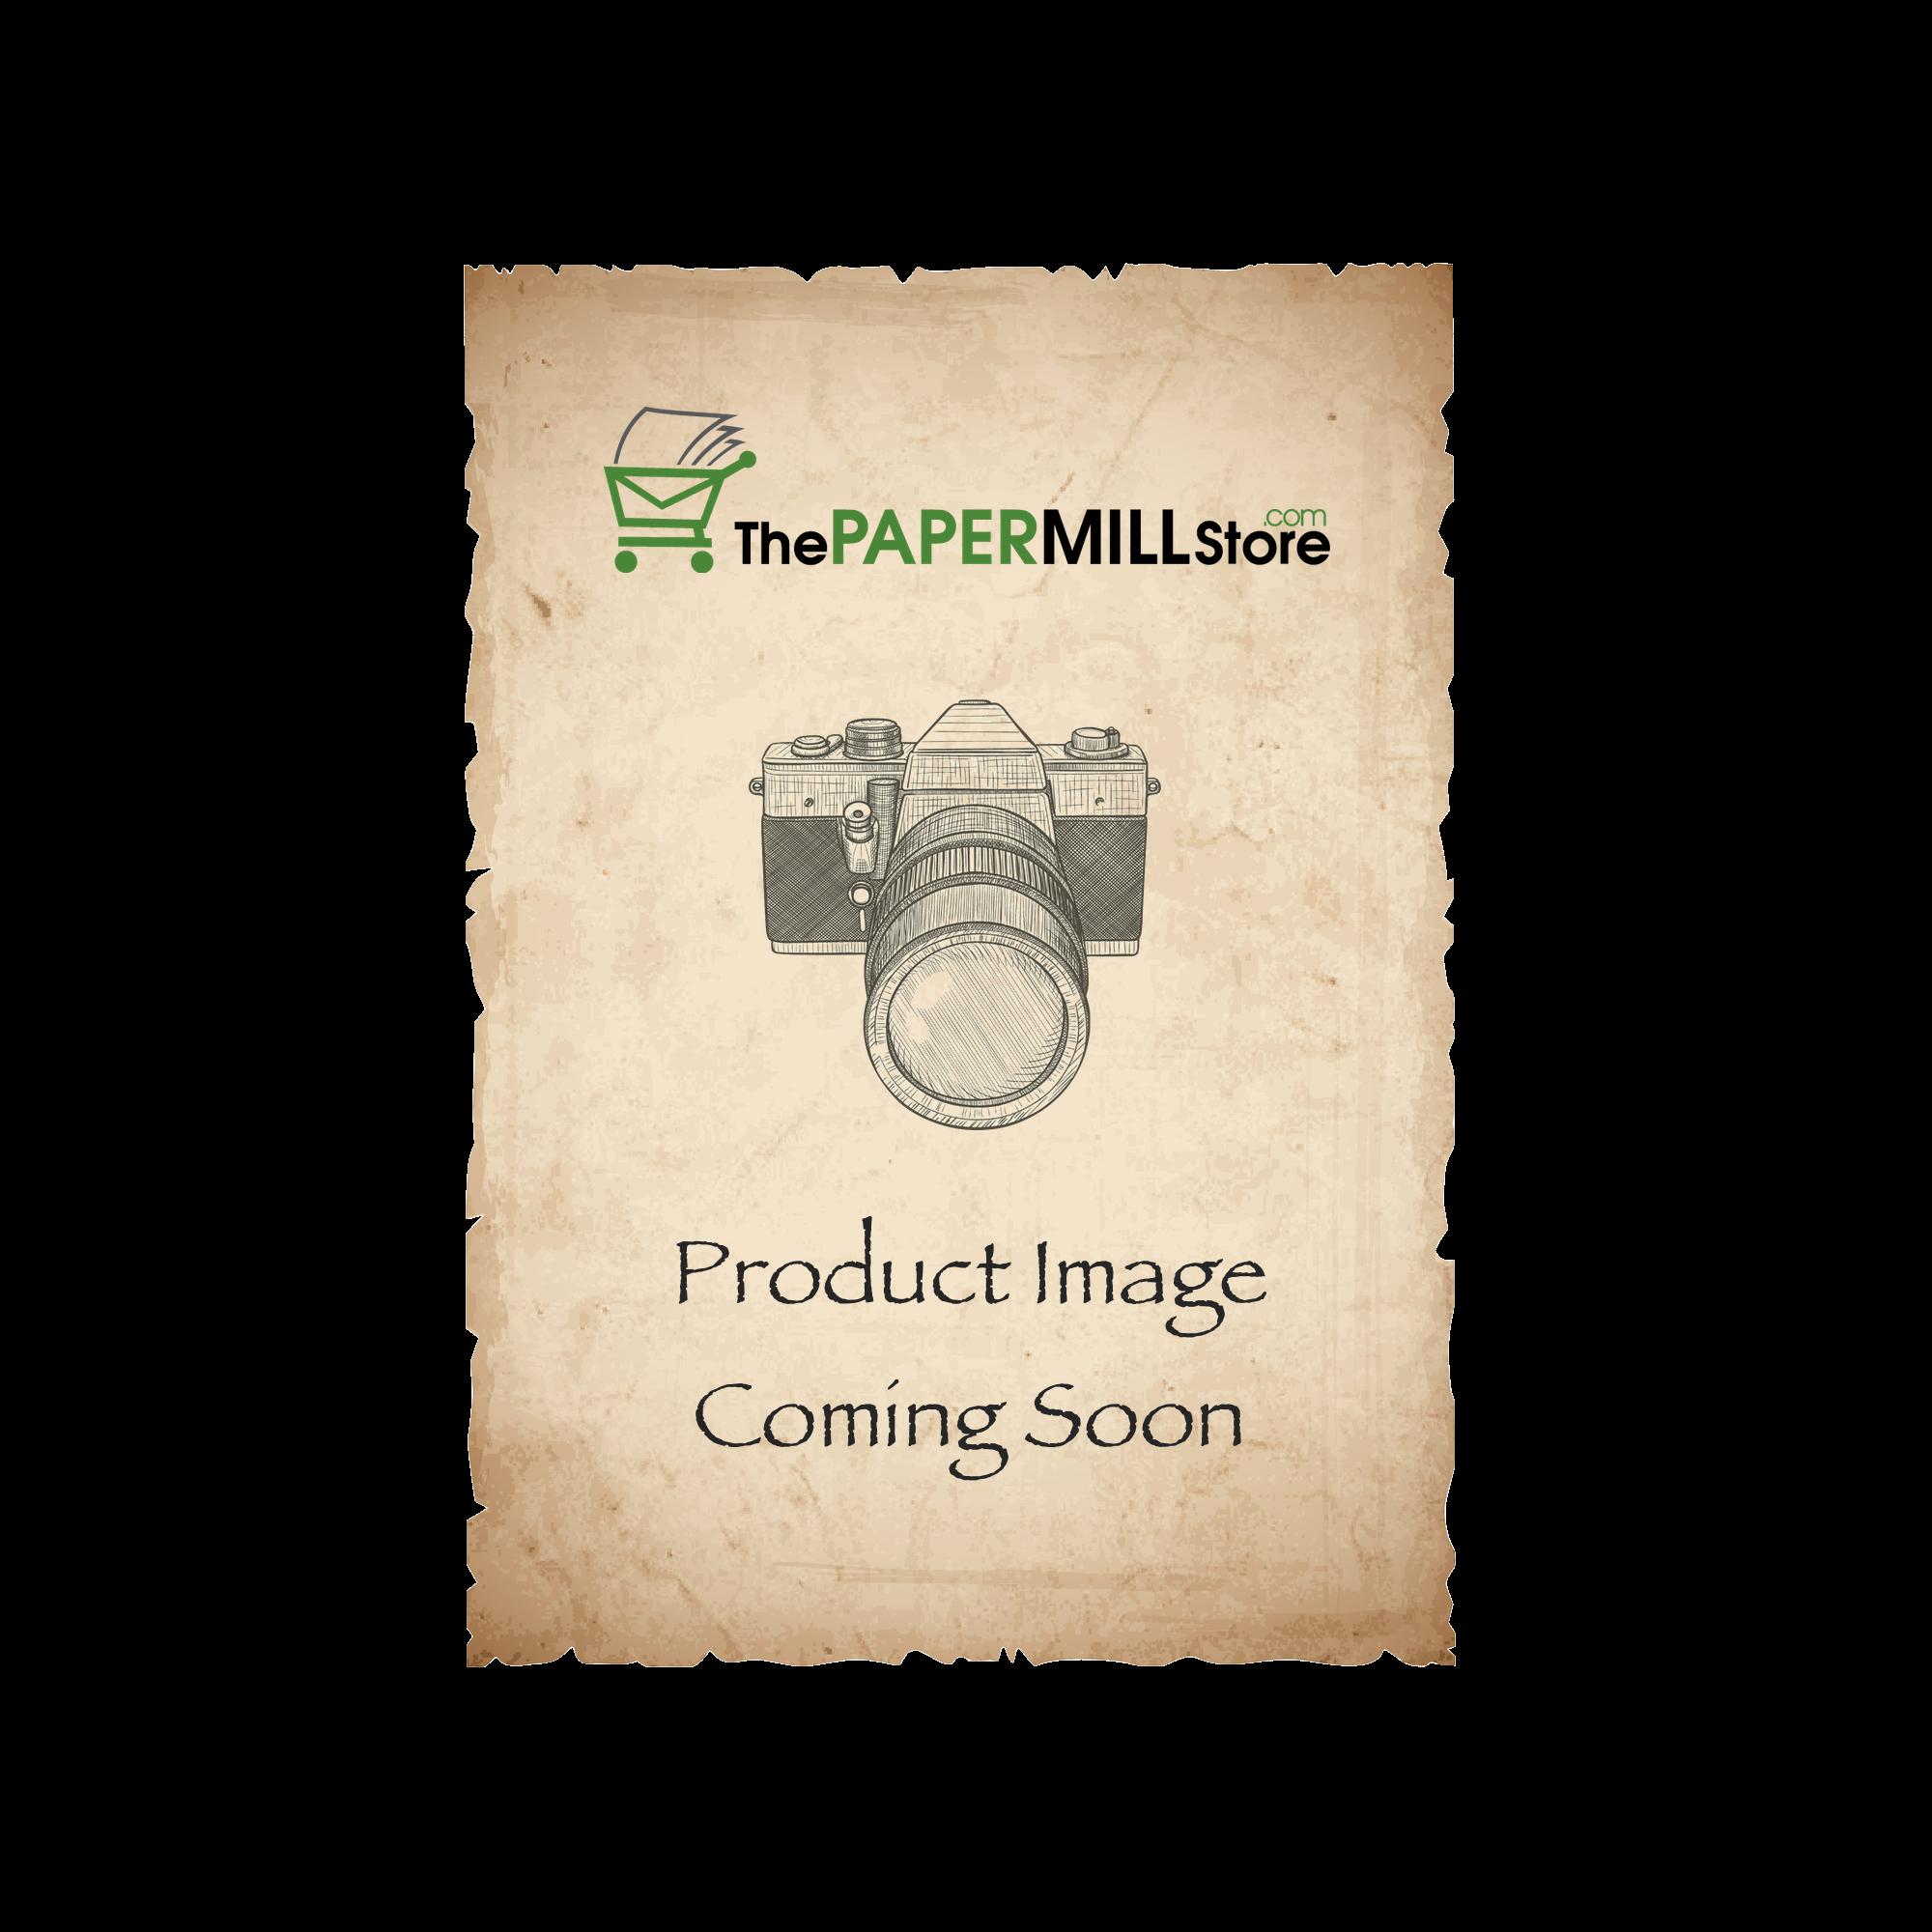 Elan Metallics Photon Green Paper - 12 x 12 in 70 lb Text Metallic C/2S 25 per Package